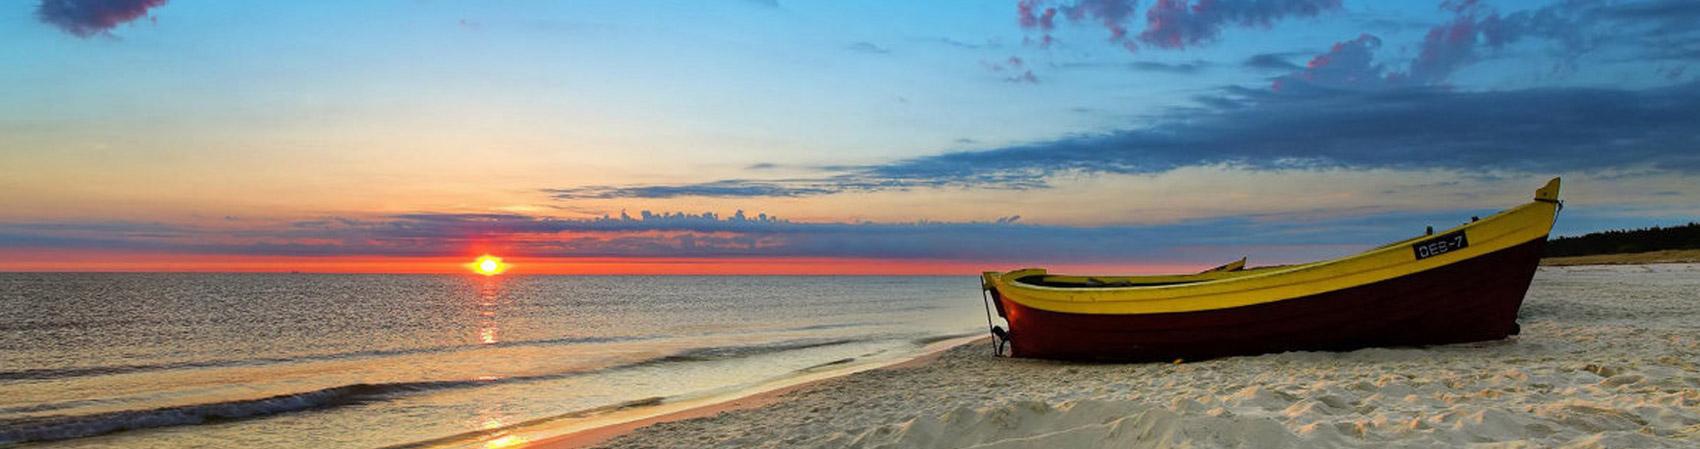 slide_scialuppa_tramonto